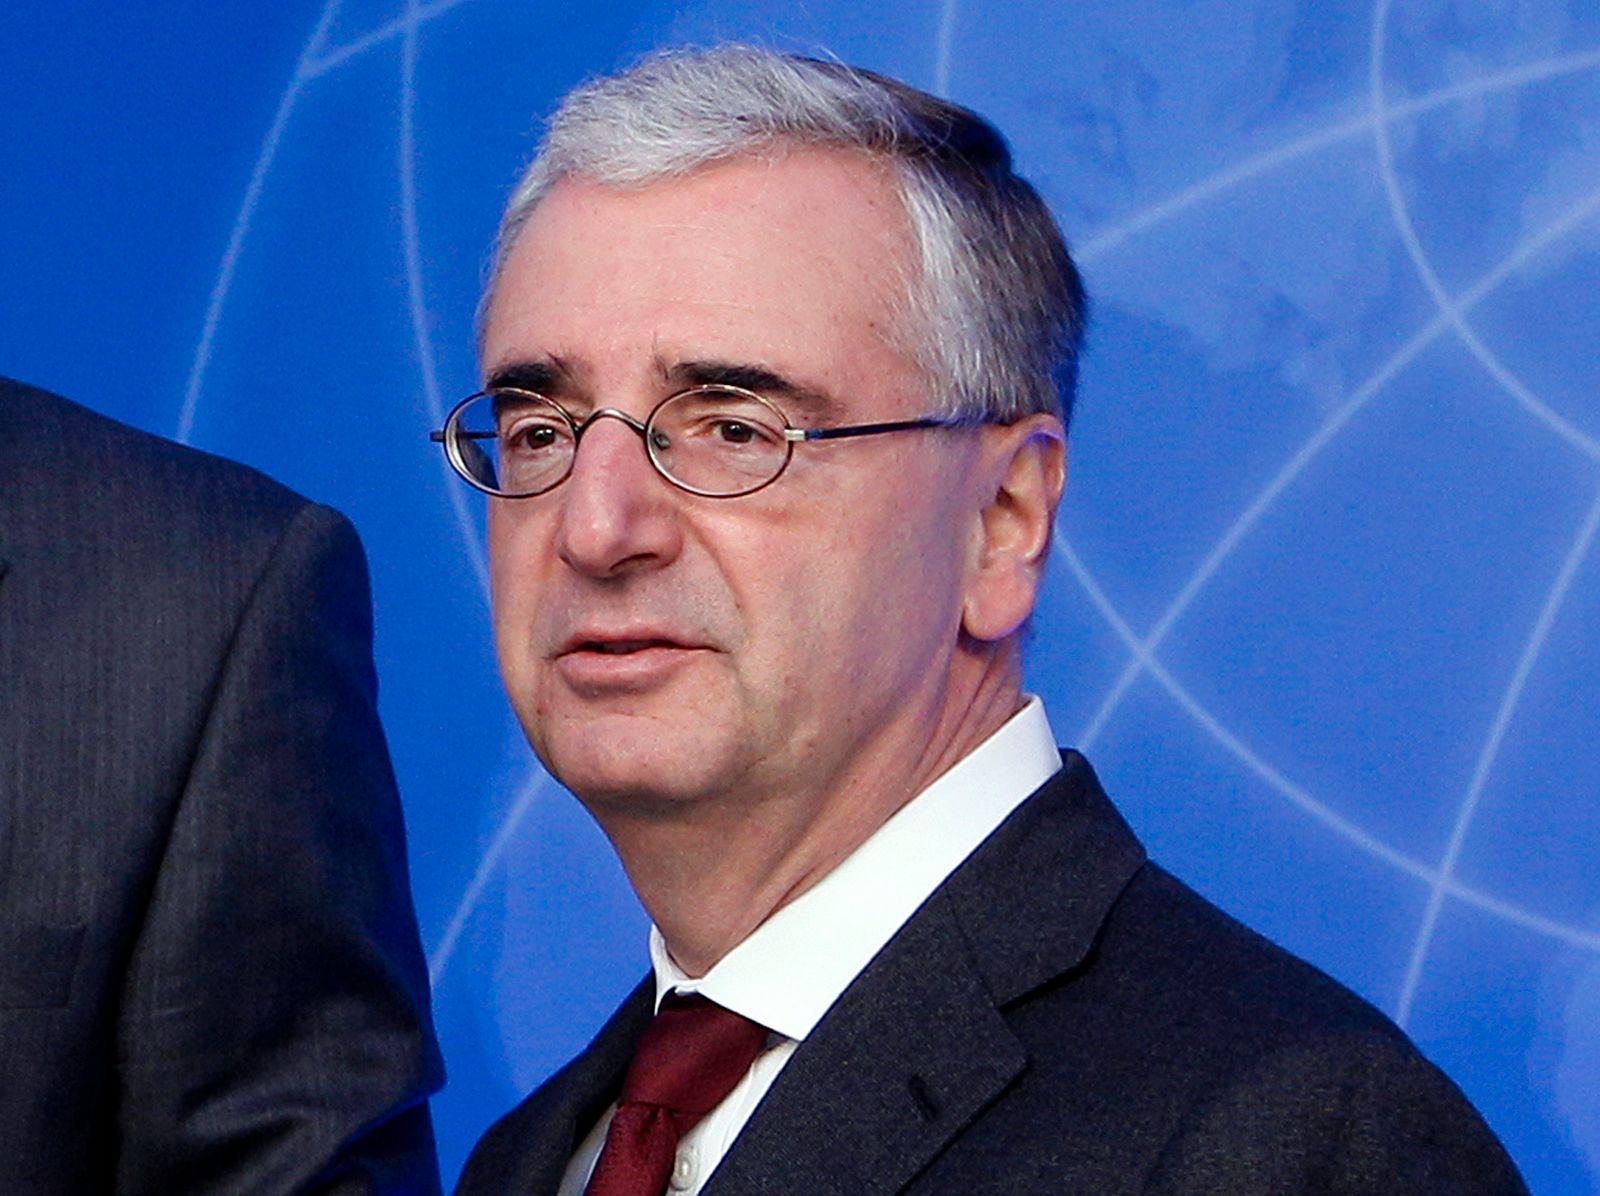 File photo of Allianz CFO Achleitner